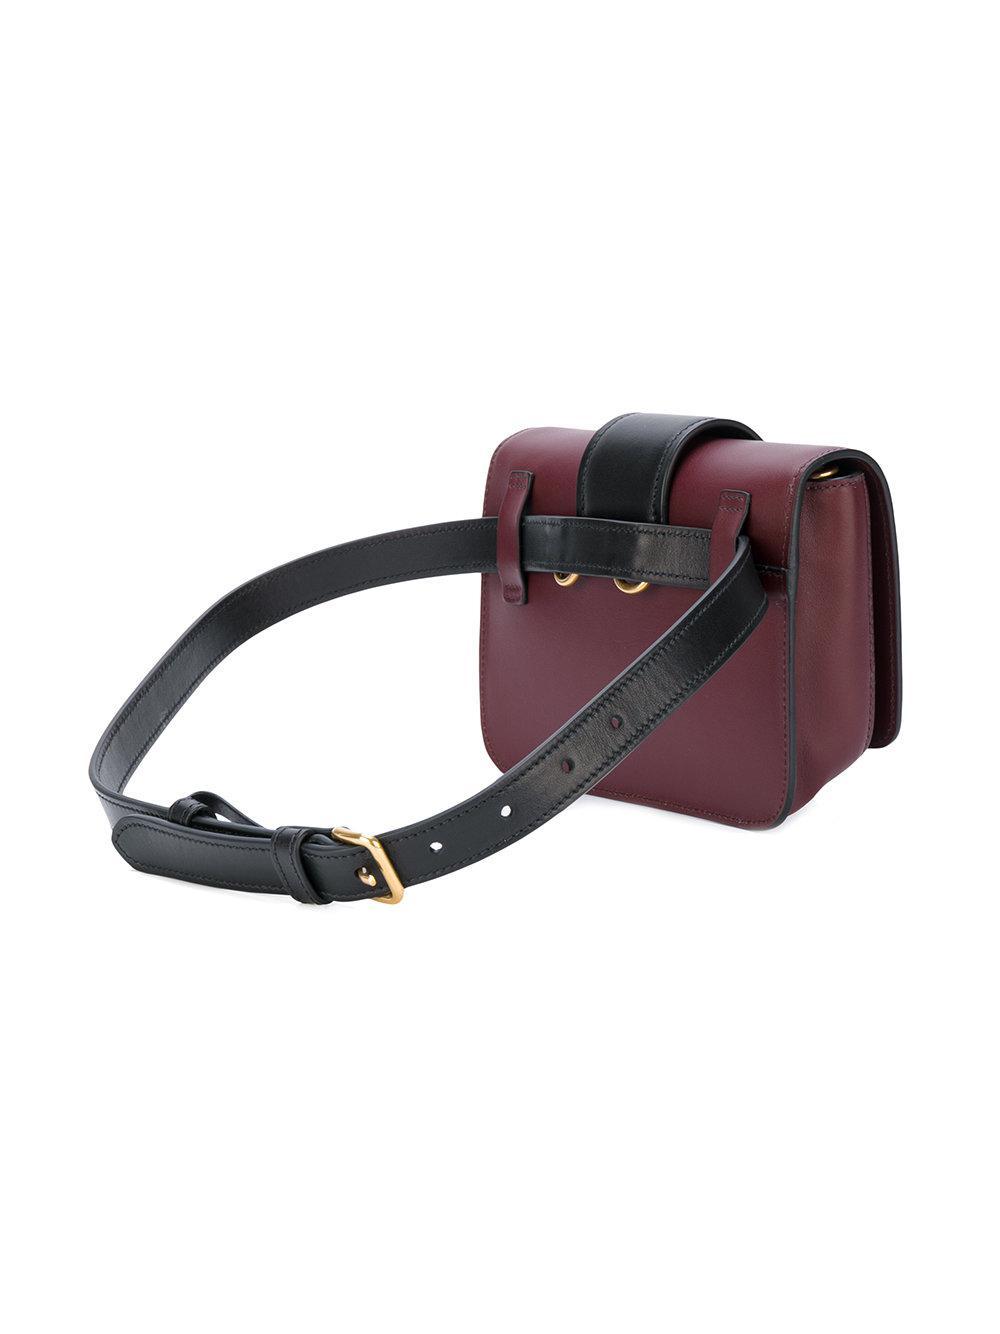 4a1fbd9877c8 ebay prada cahier small velvet convertible belt bag neiman marcus 8da67  1c49e; netherlands lyst prada cahier convertible belt bag c6261 c52ea